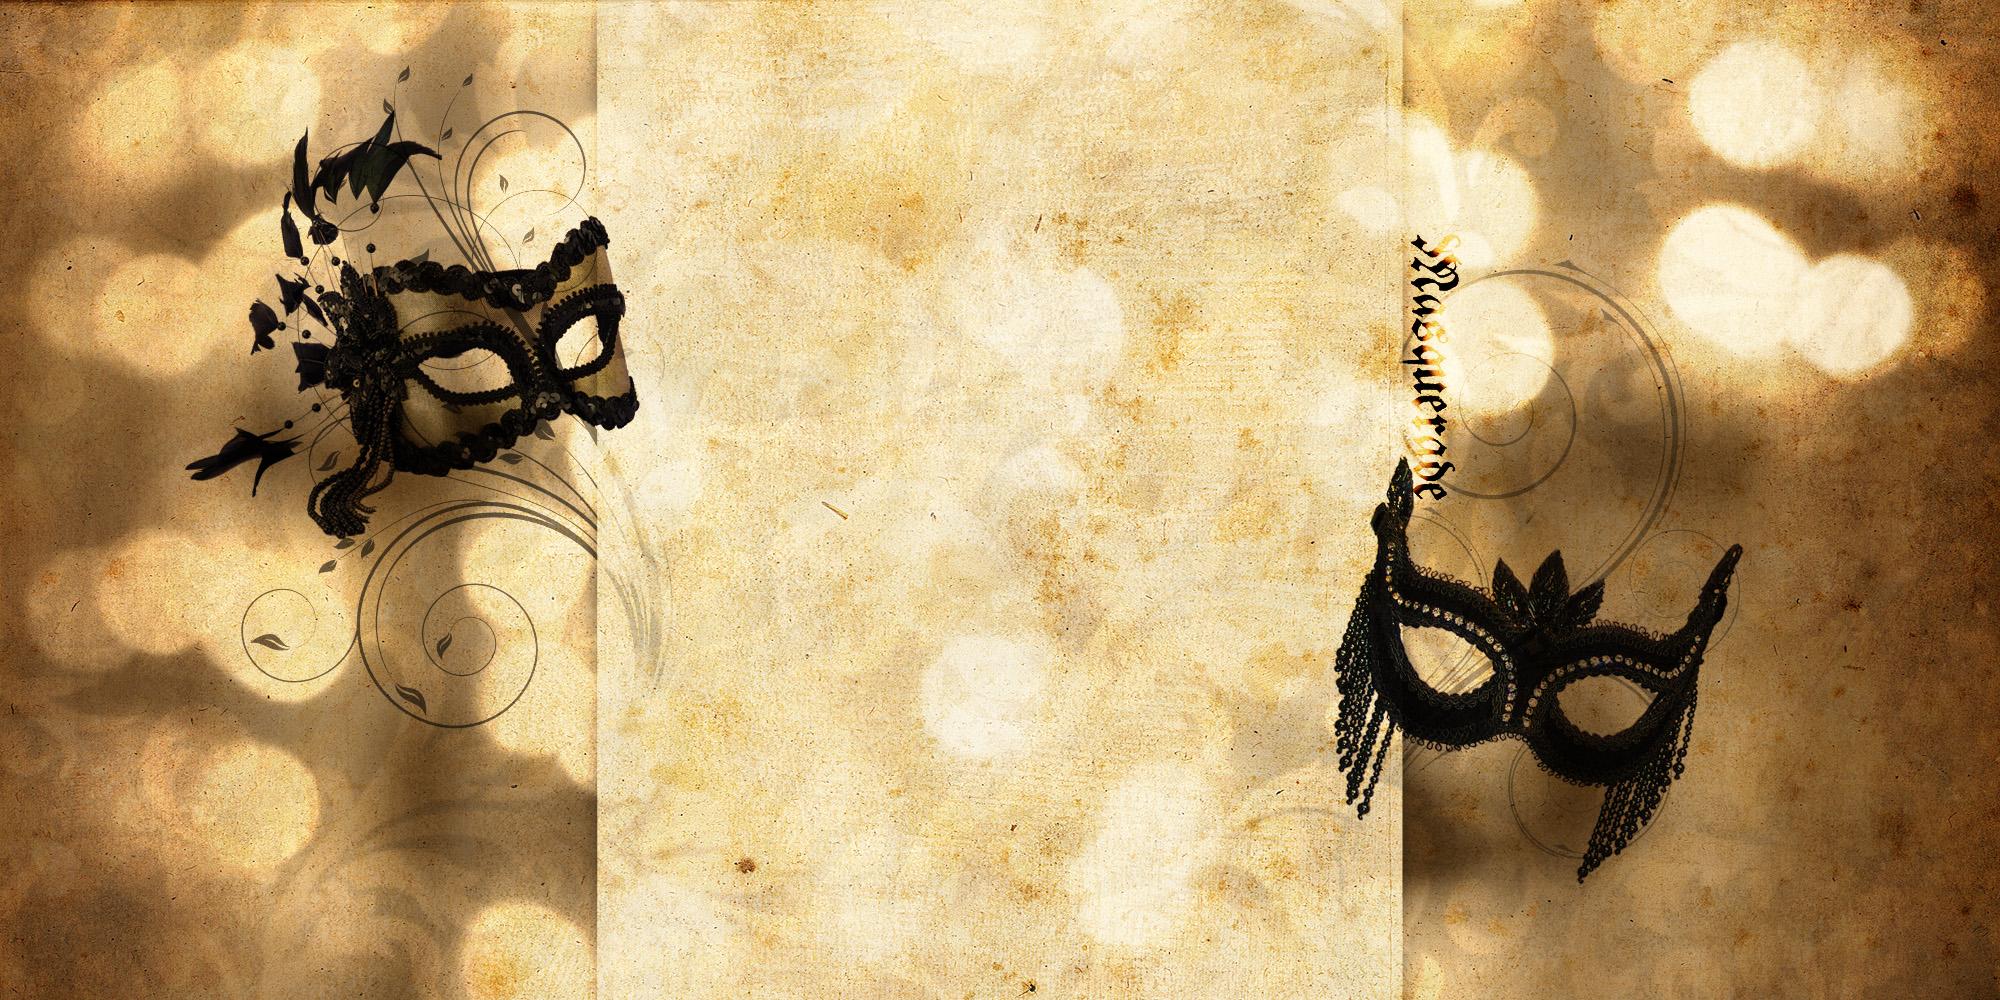 masquerade mask black background wallpaper - photo #30